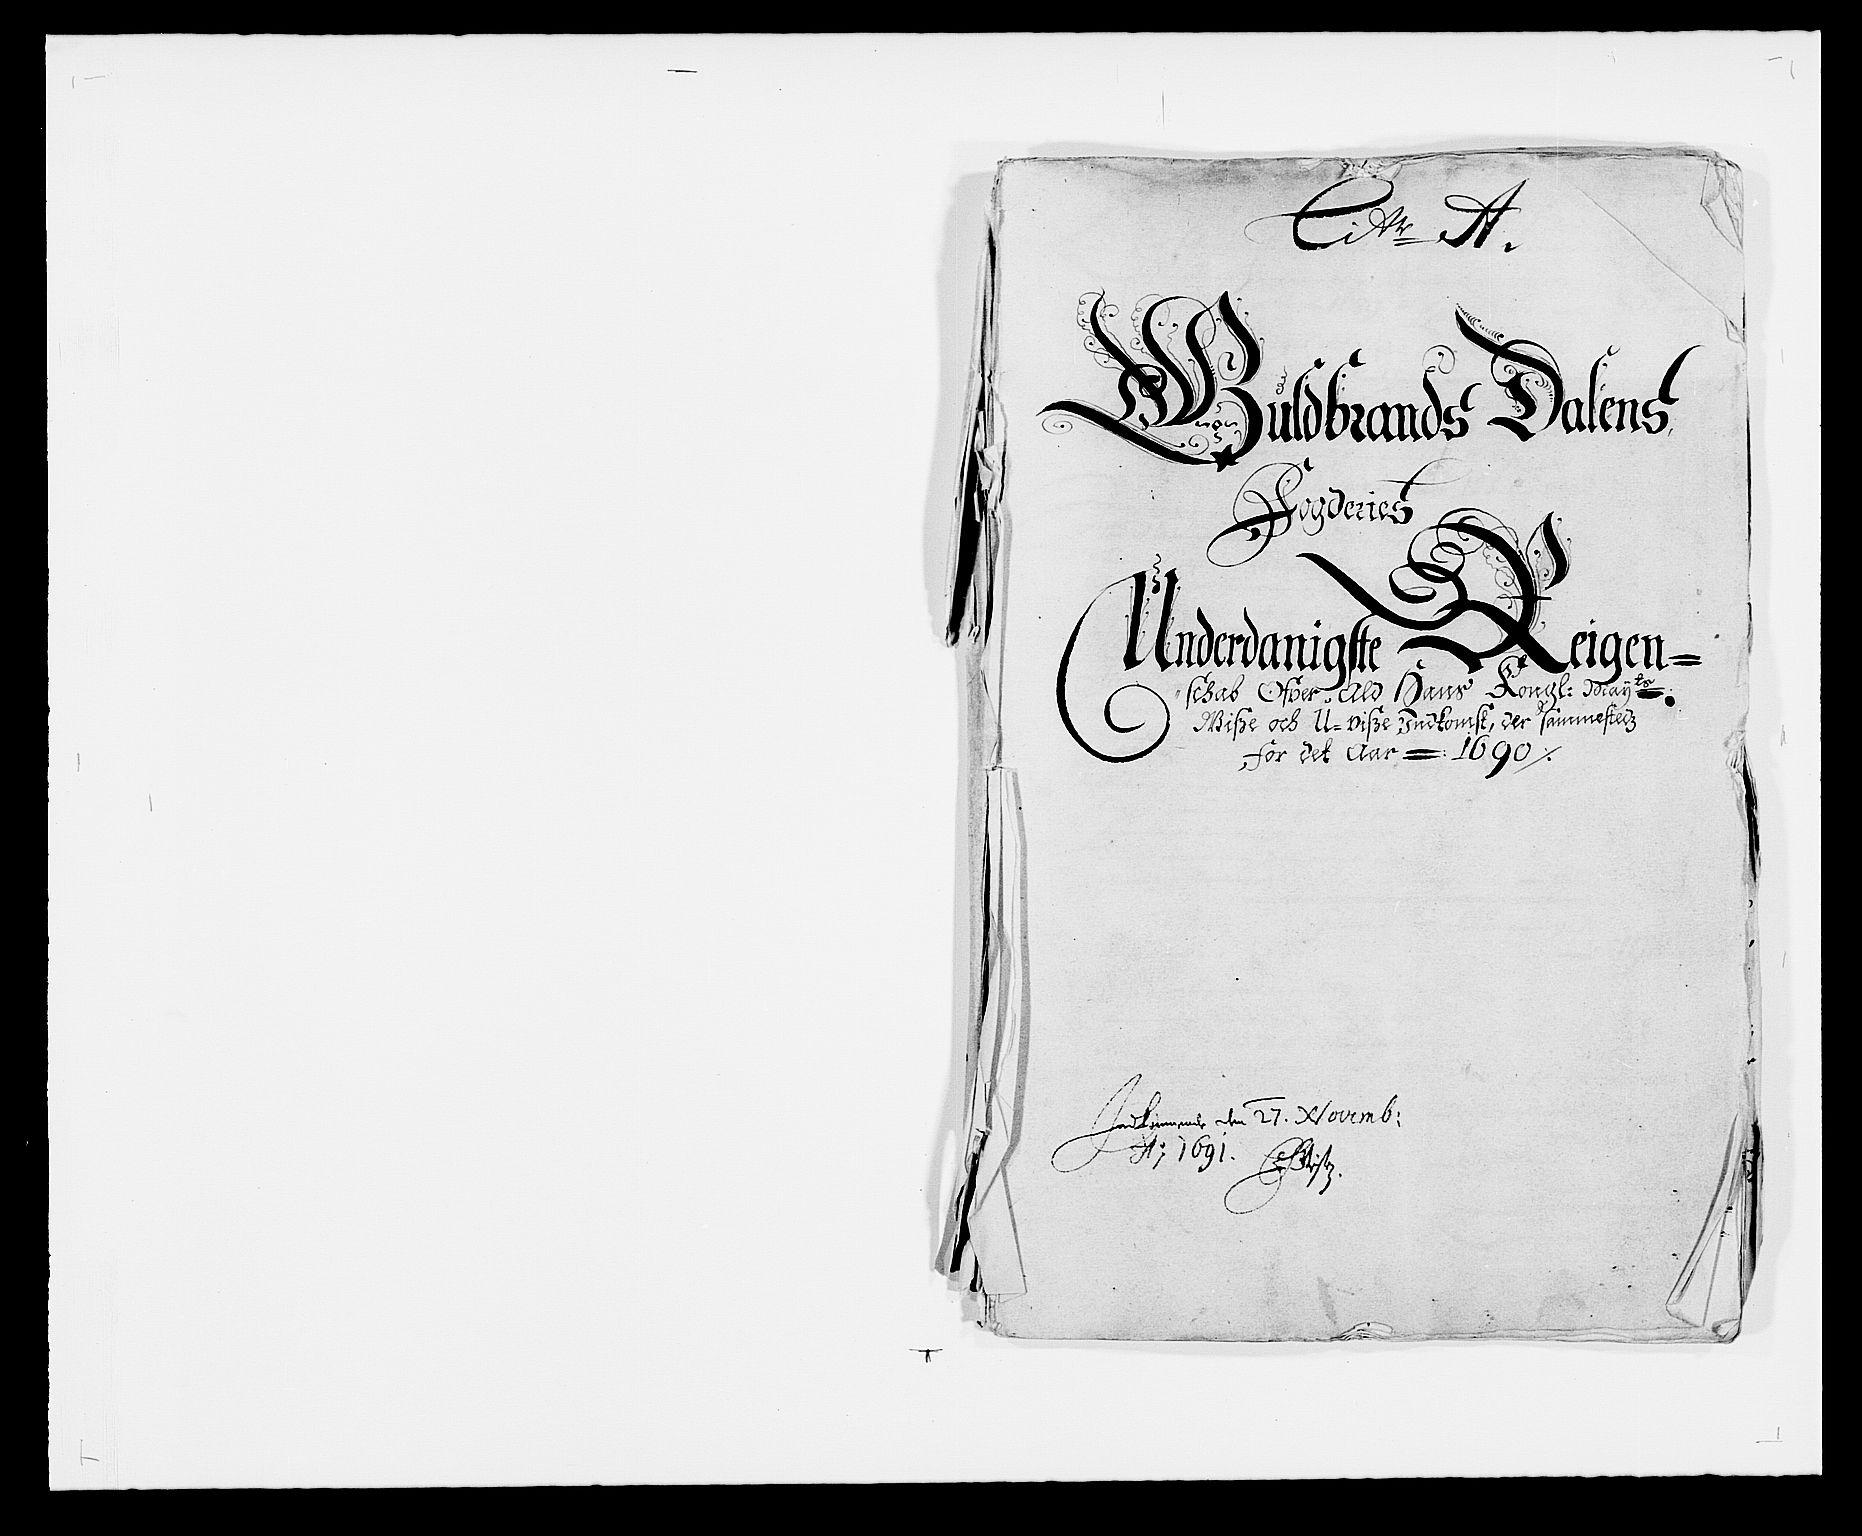 RA, Rentekammeret inntil 1814, Reviderte regnskaper, Fogderegnskap, R17/L1165: Fogderegnskap Gudbrandsdal, 1690-1692, s. 20